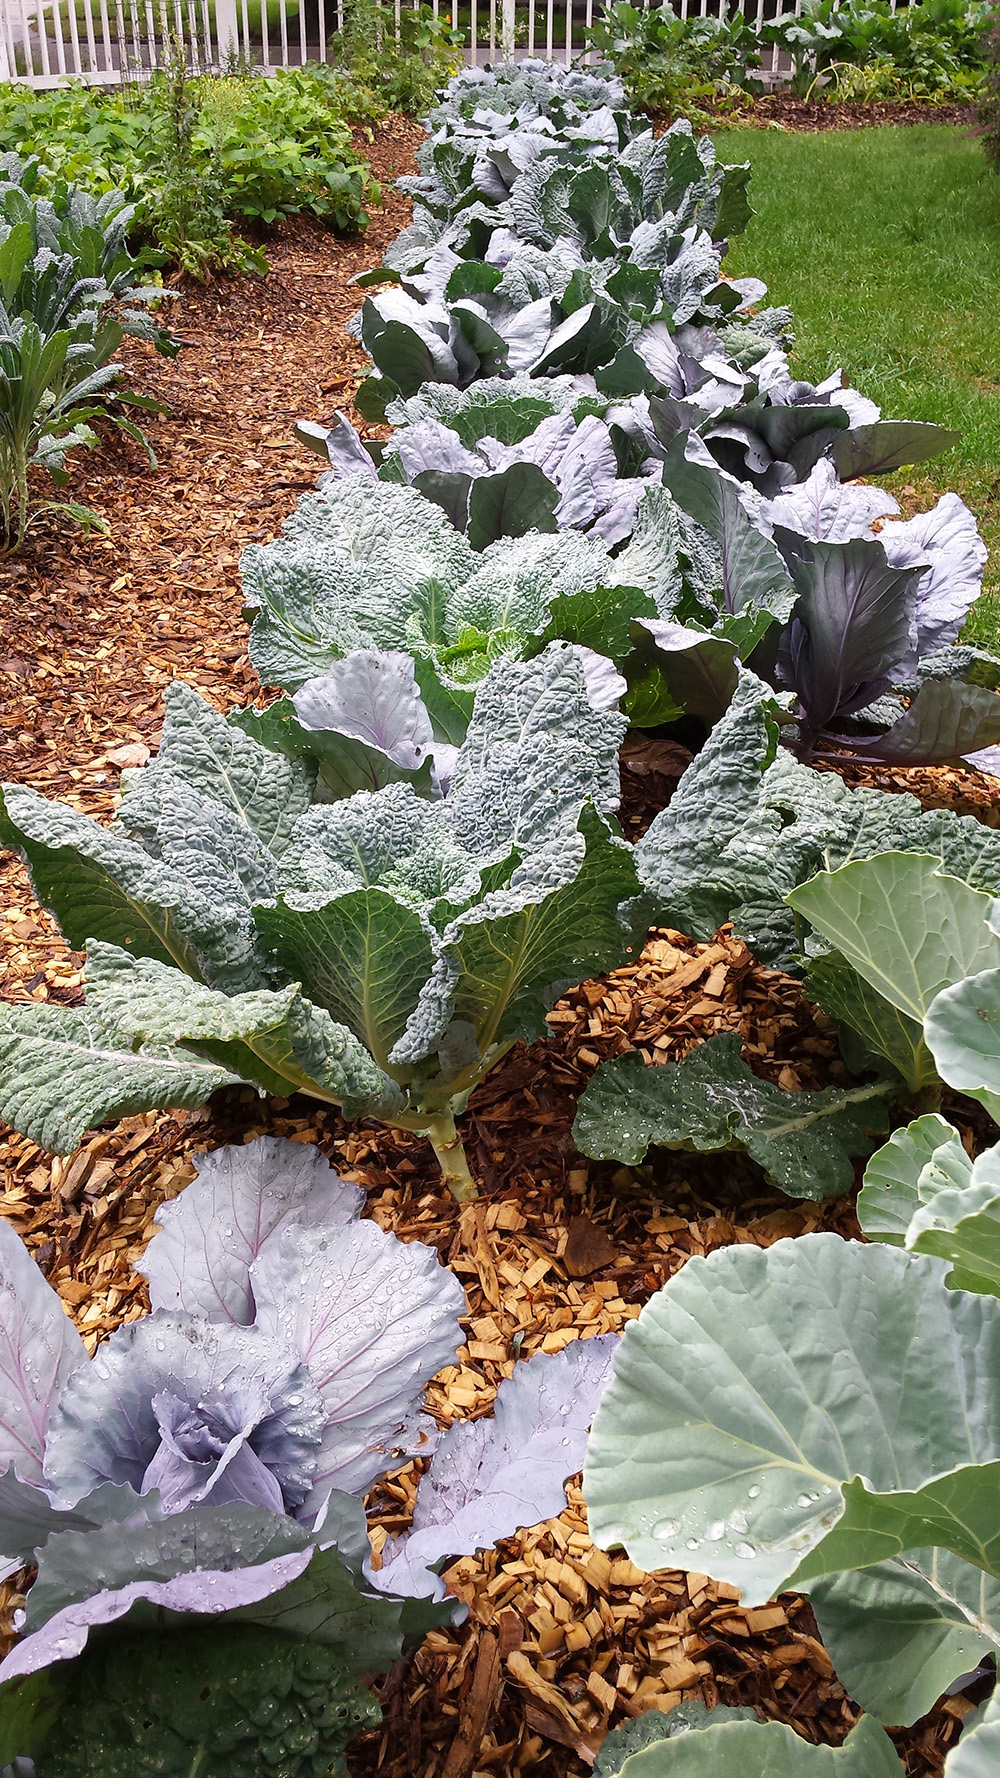 farming the neighborhood u2014 thrifty good life